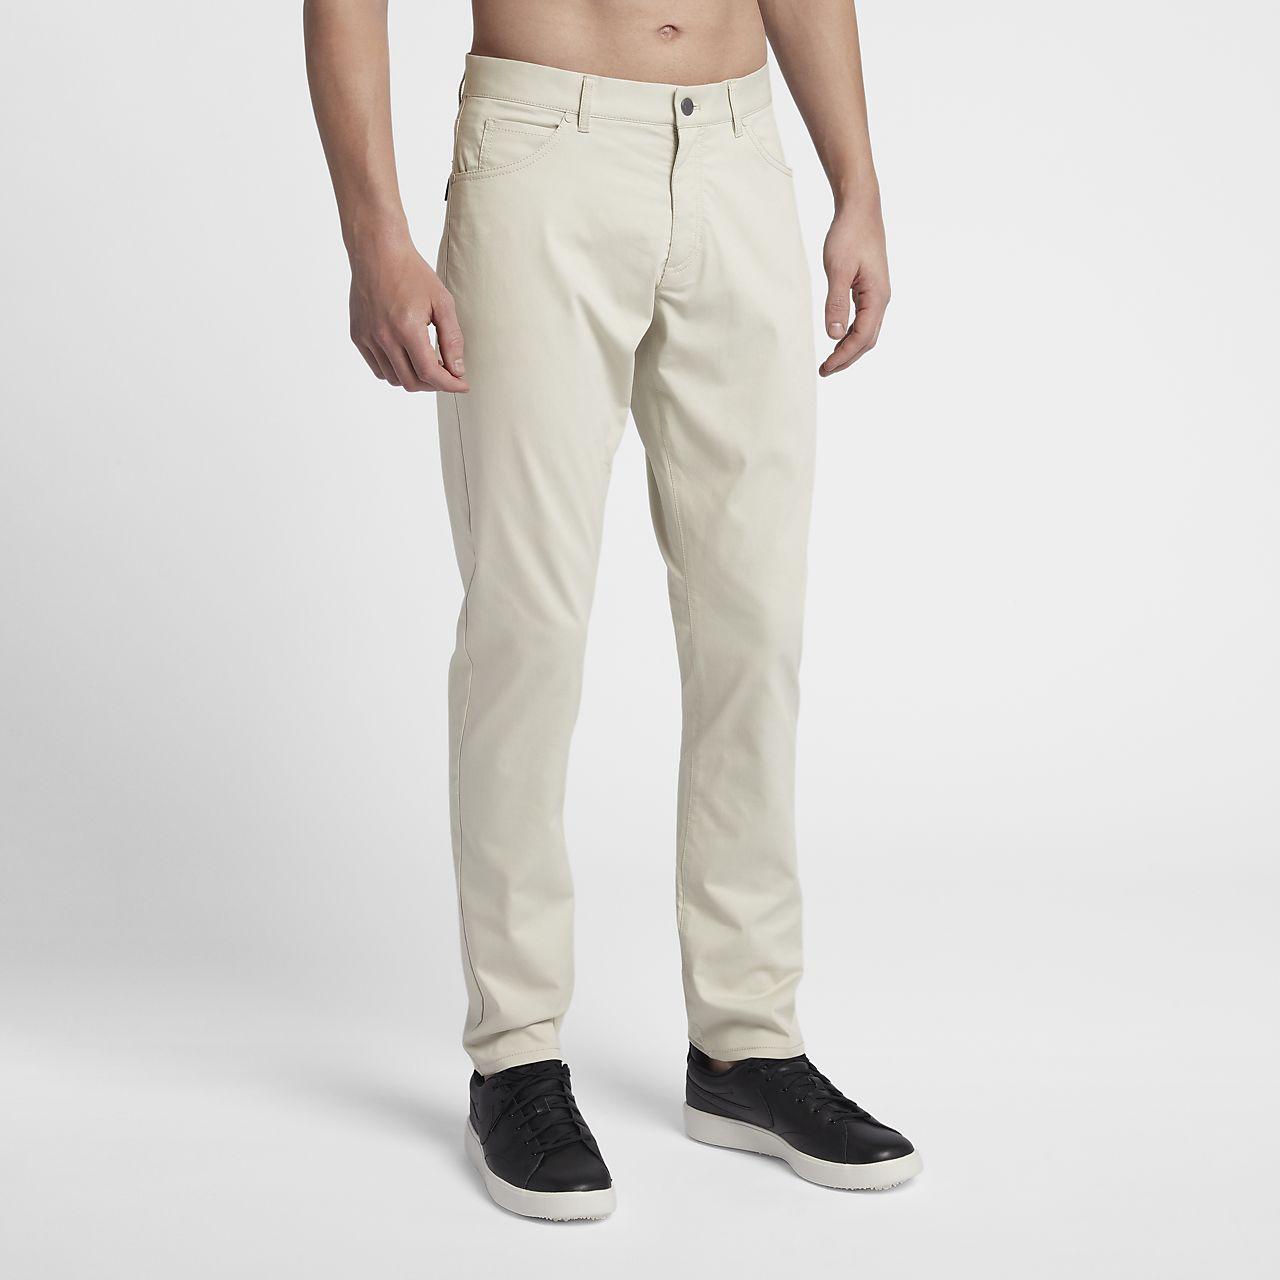 635bdfbc958 Nike Flex Men s Slim-Fit 5-Pocket Golf Trousers. Nike.com GB